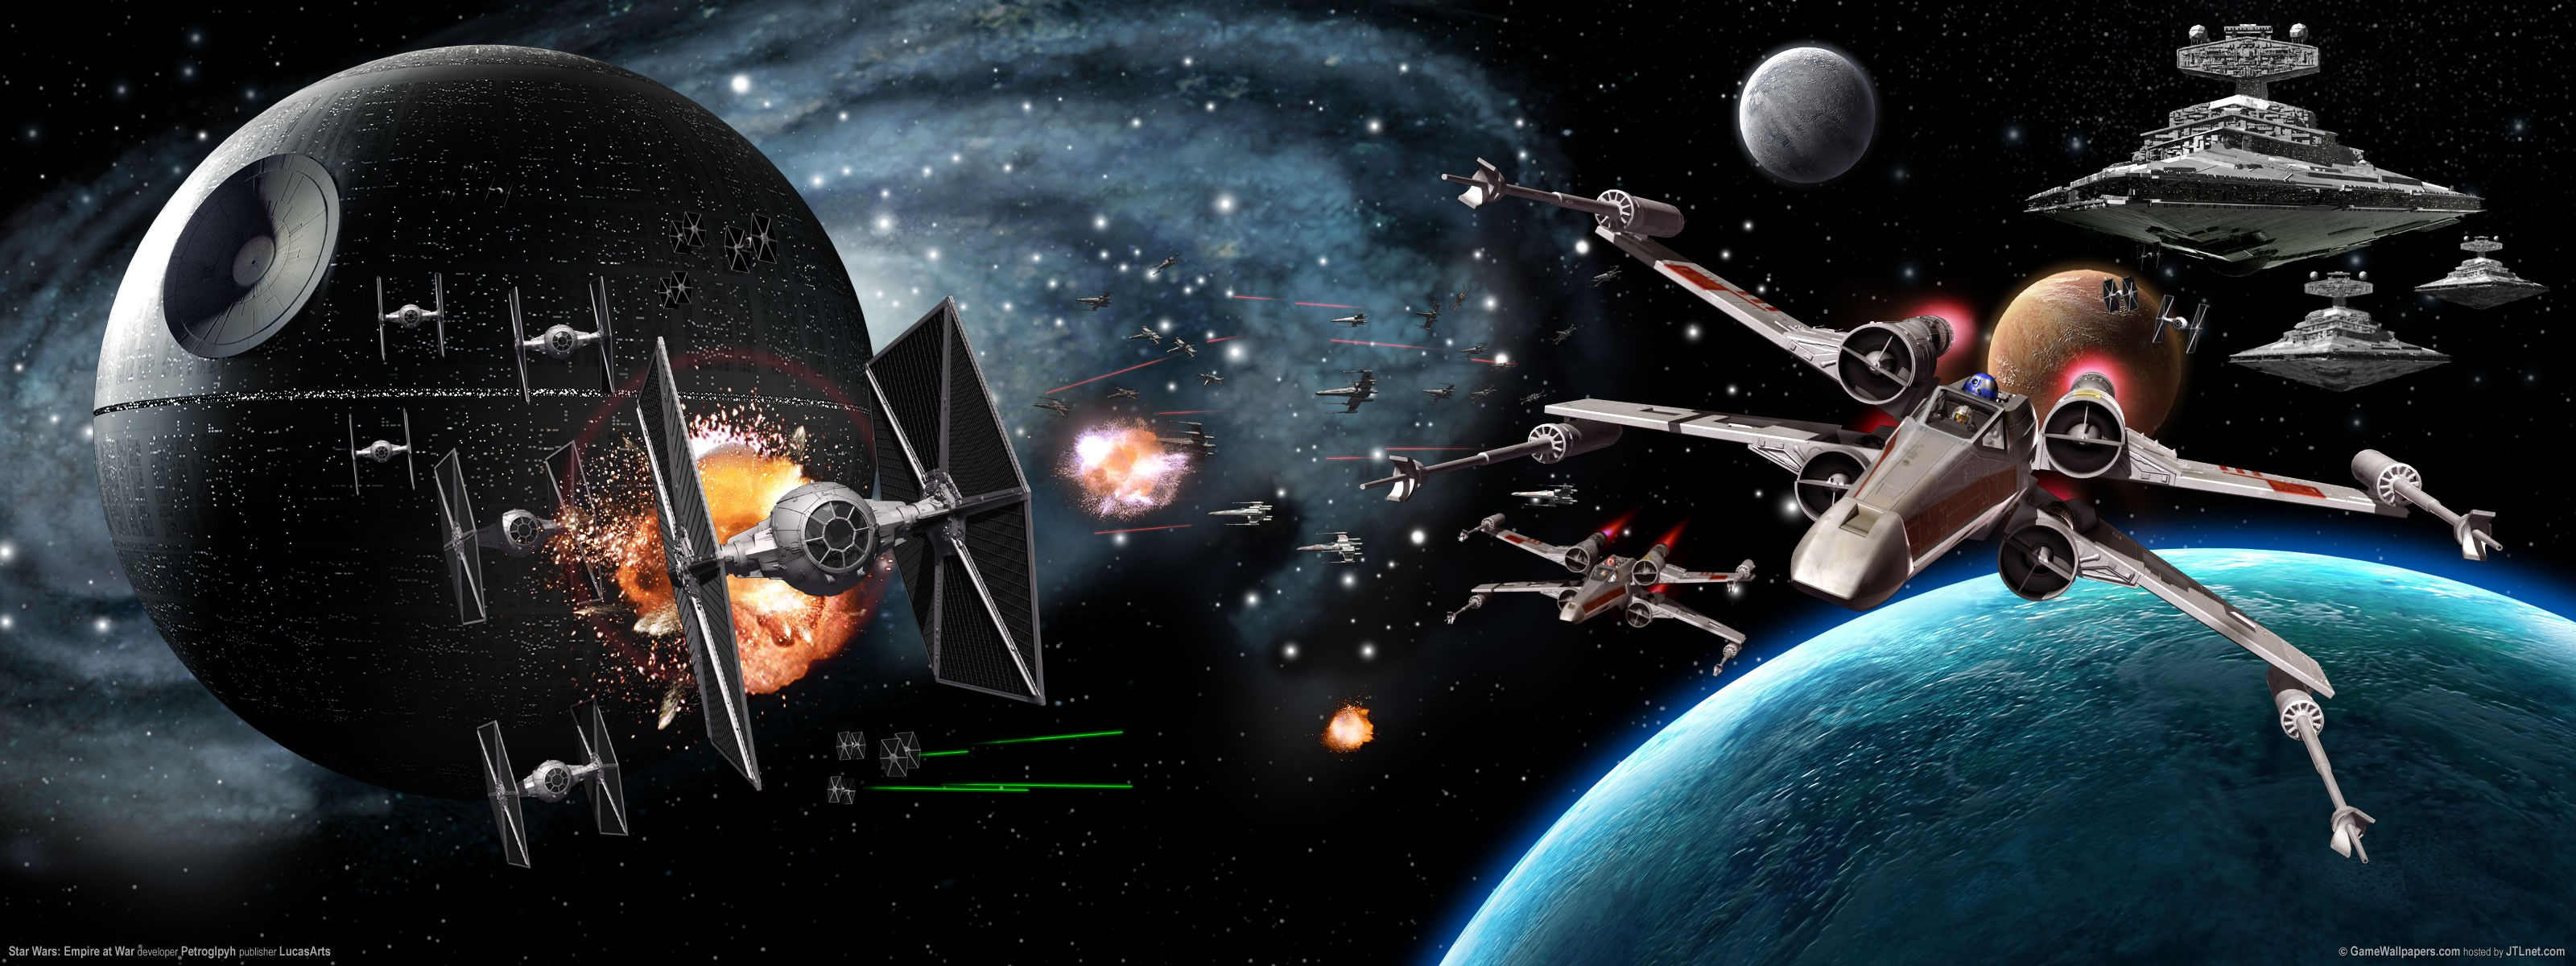 -Star-Wars-Death-Star-X-wing-Tie-Fighters-Star-Destroyers-Fresh-New-Hd-Wallpaper--